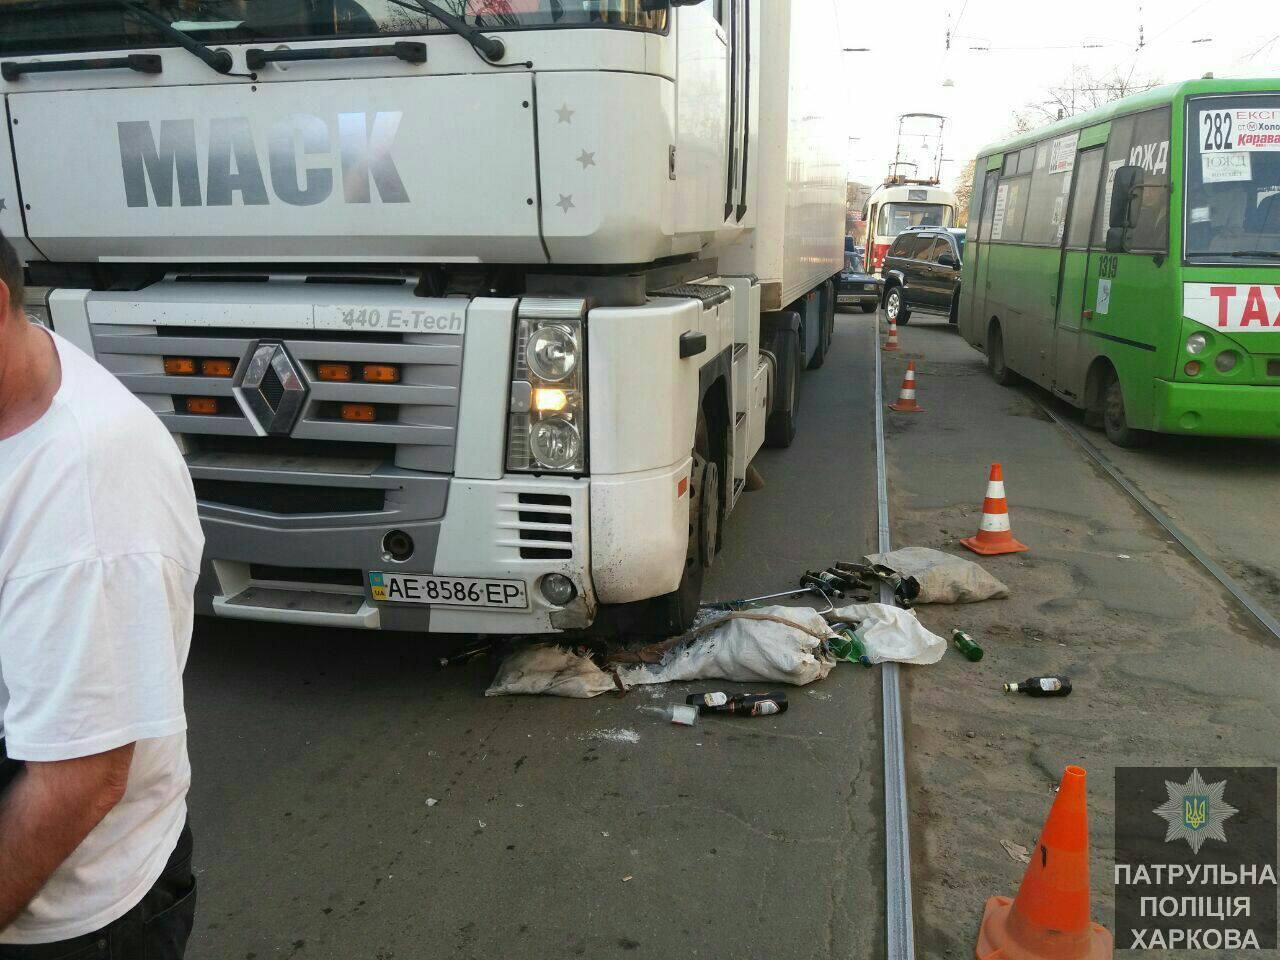 Авария: Грузовик сбил женщину (ФОТО)